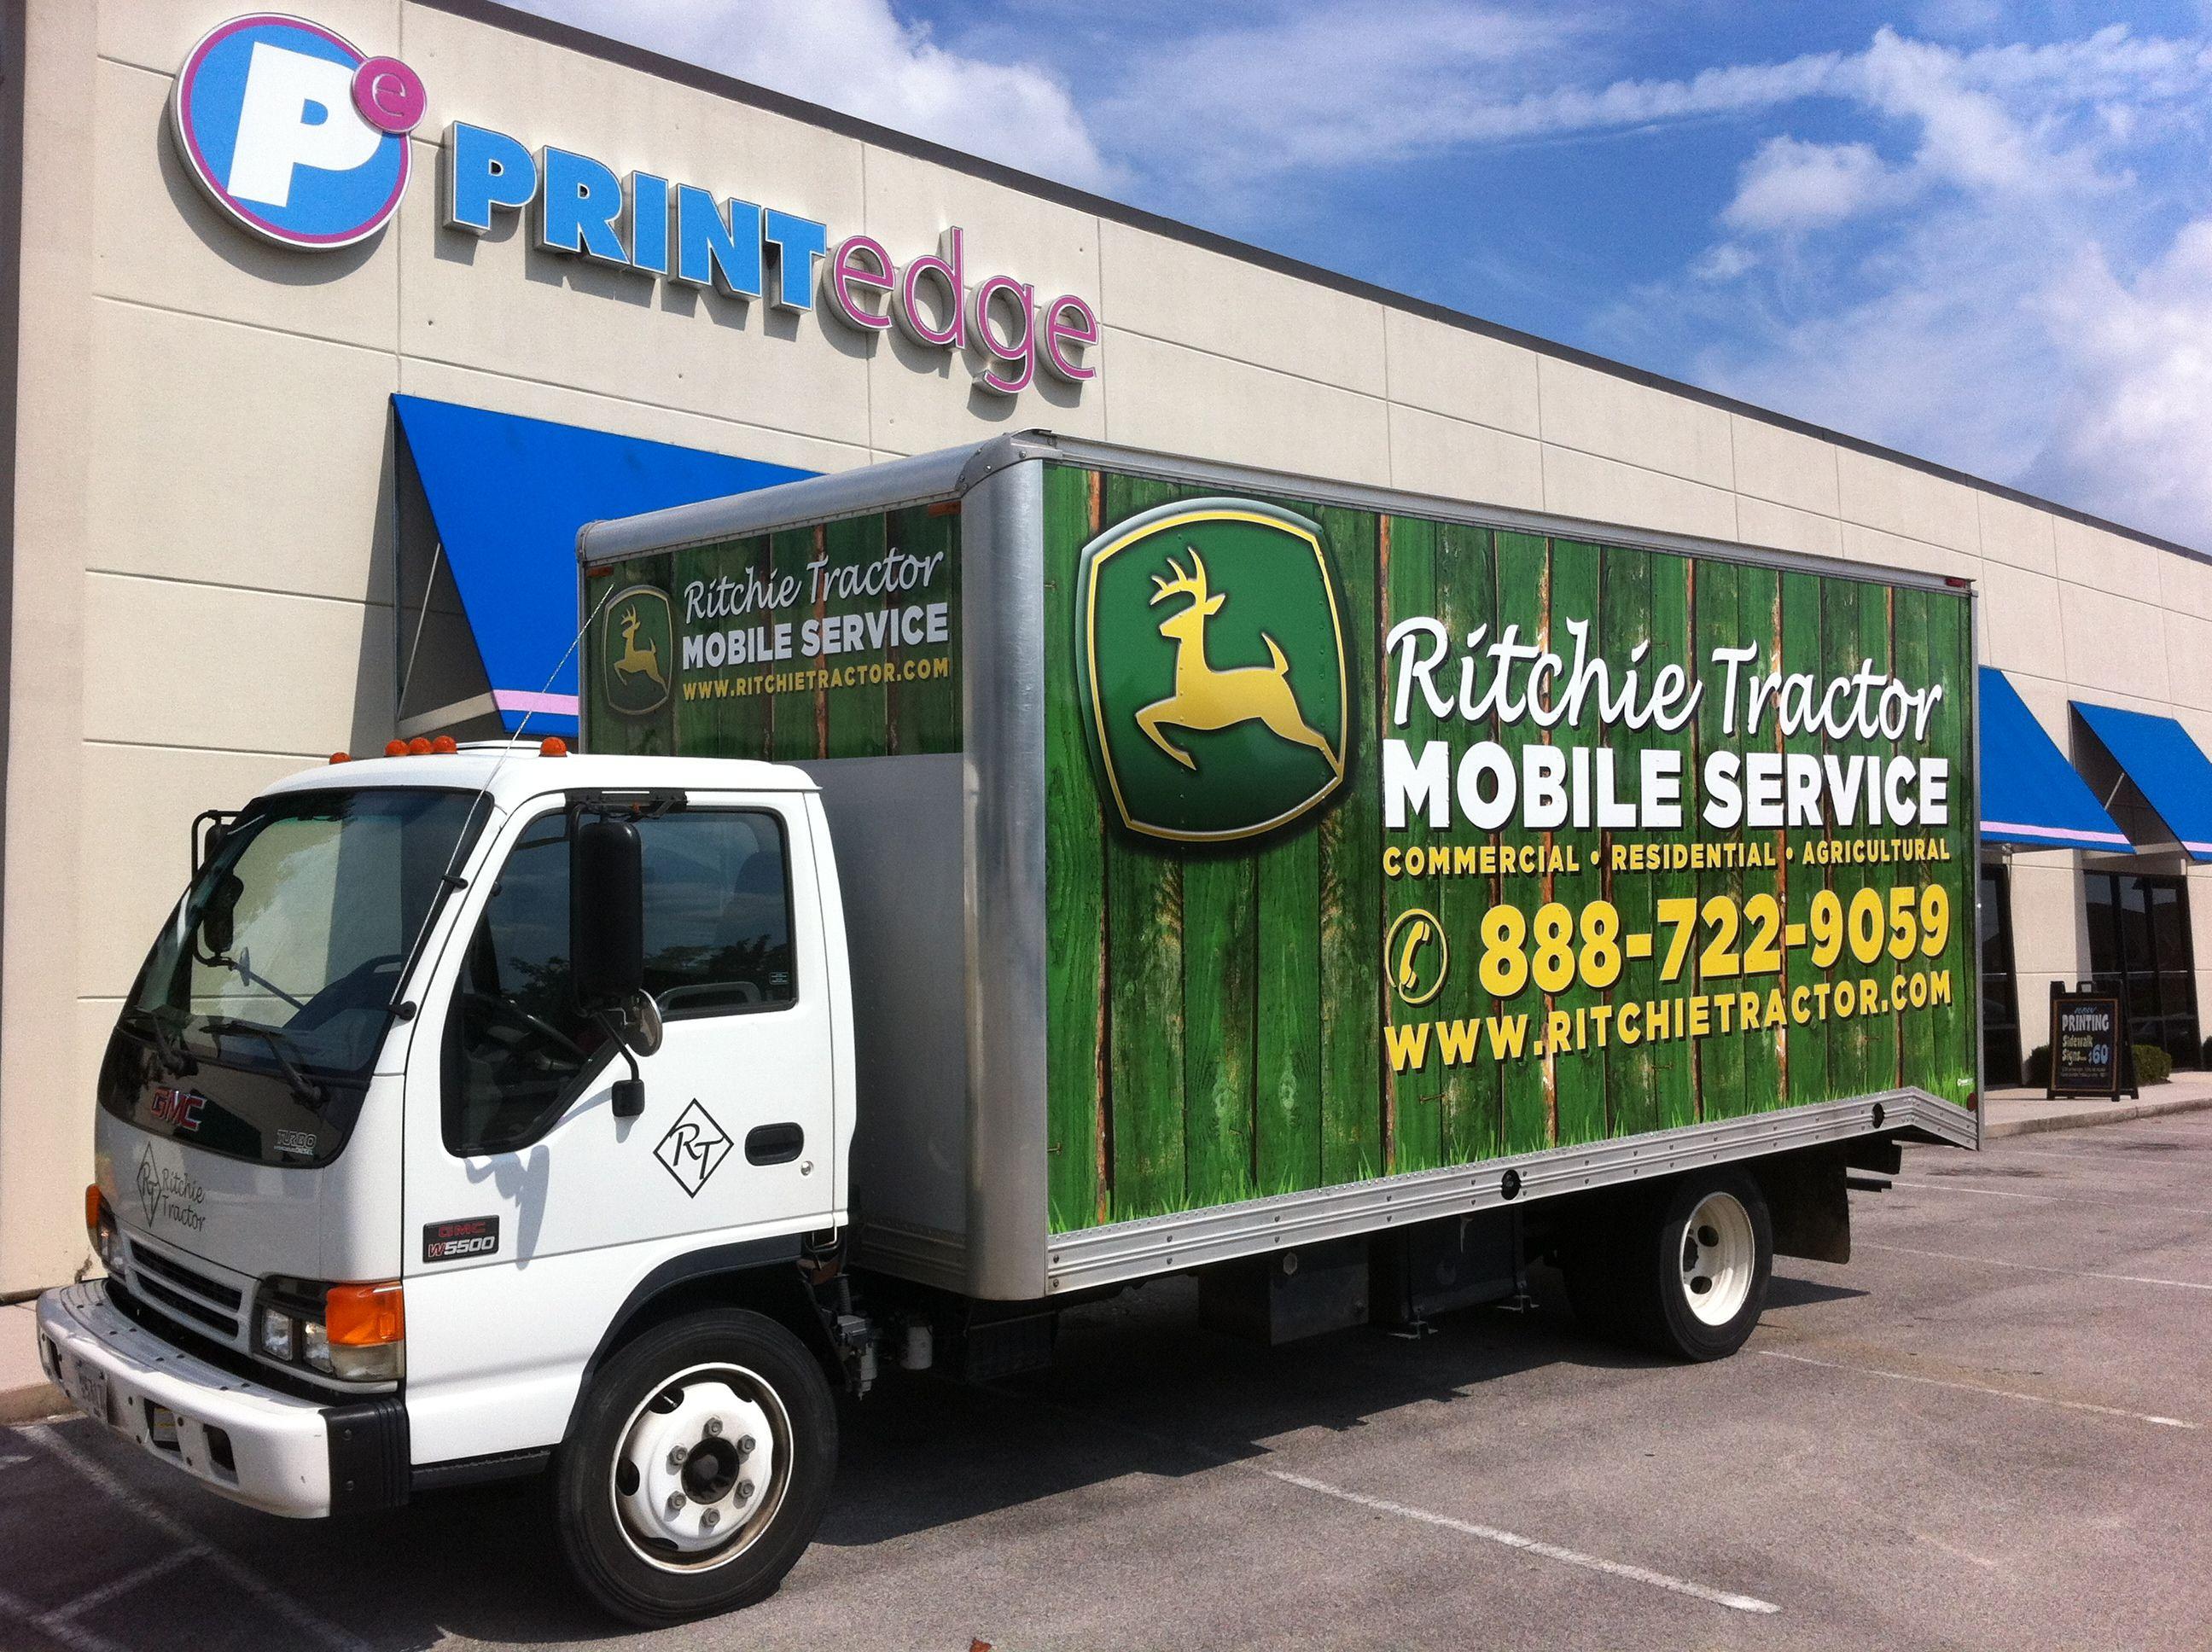 Ritchie tractor box truck wrap knoxville tn vehiclegraphics vehiclewraps vinylwraps vehicle wrapstractortruck